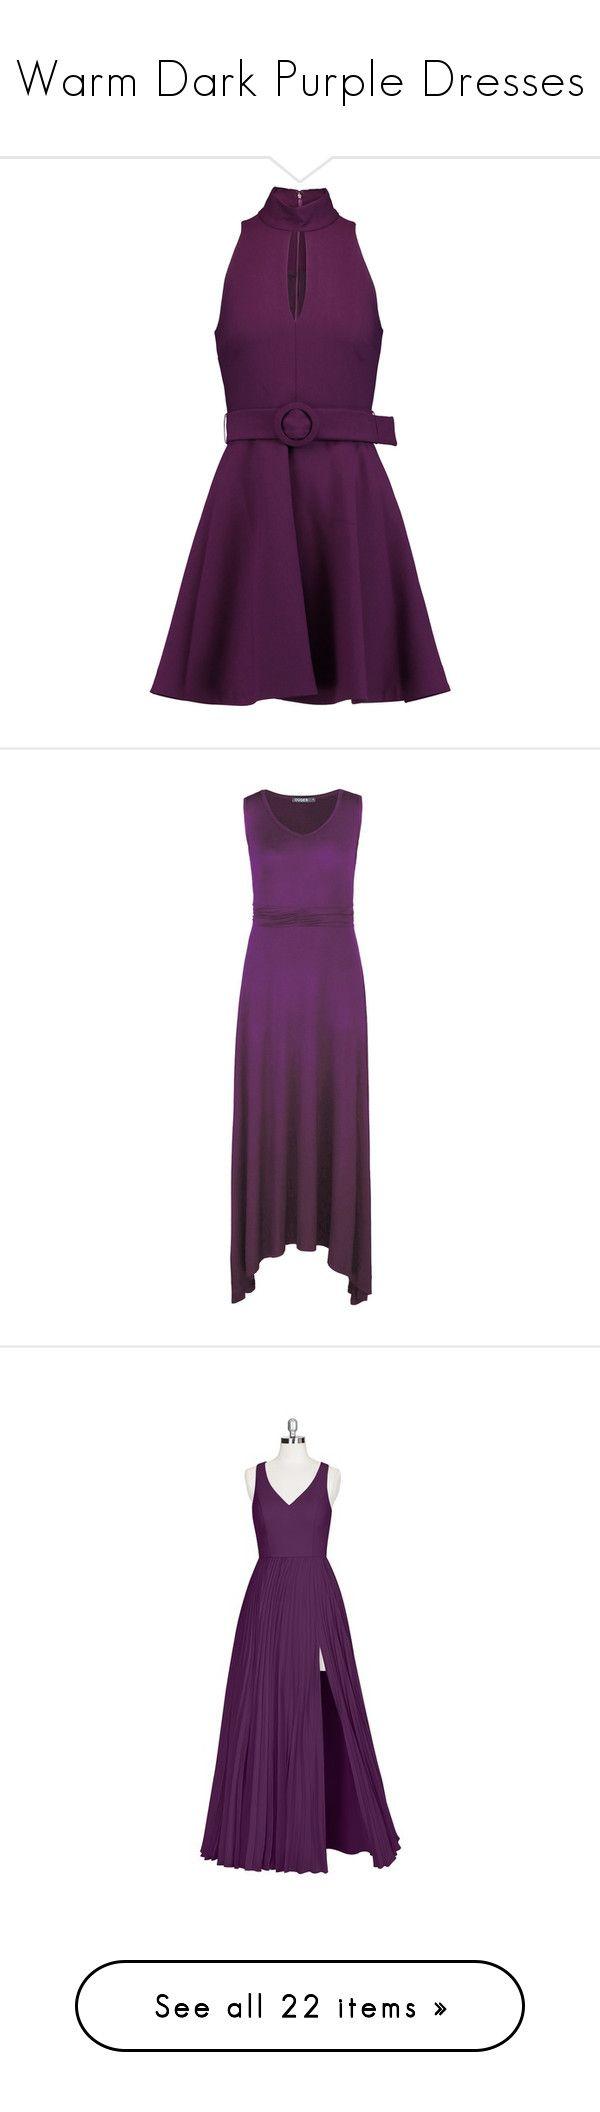 """Warm Dark Purple Dresses"" by tegan-b-riley on Polyvore featuring dresses, purple, cut-out dresses, stretch mini dress, cutout dresses, purple dresses, cut out mini dress, purple summer dresses, maxi length dresses and v neckline dress"